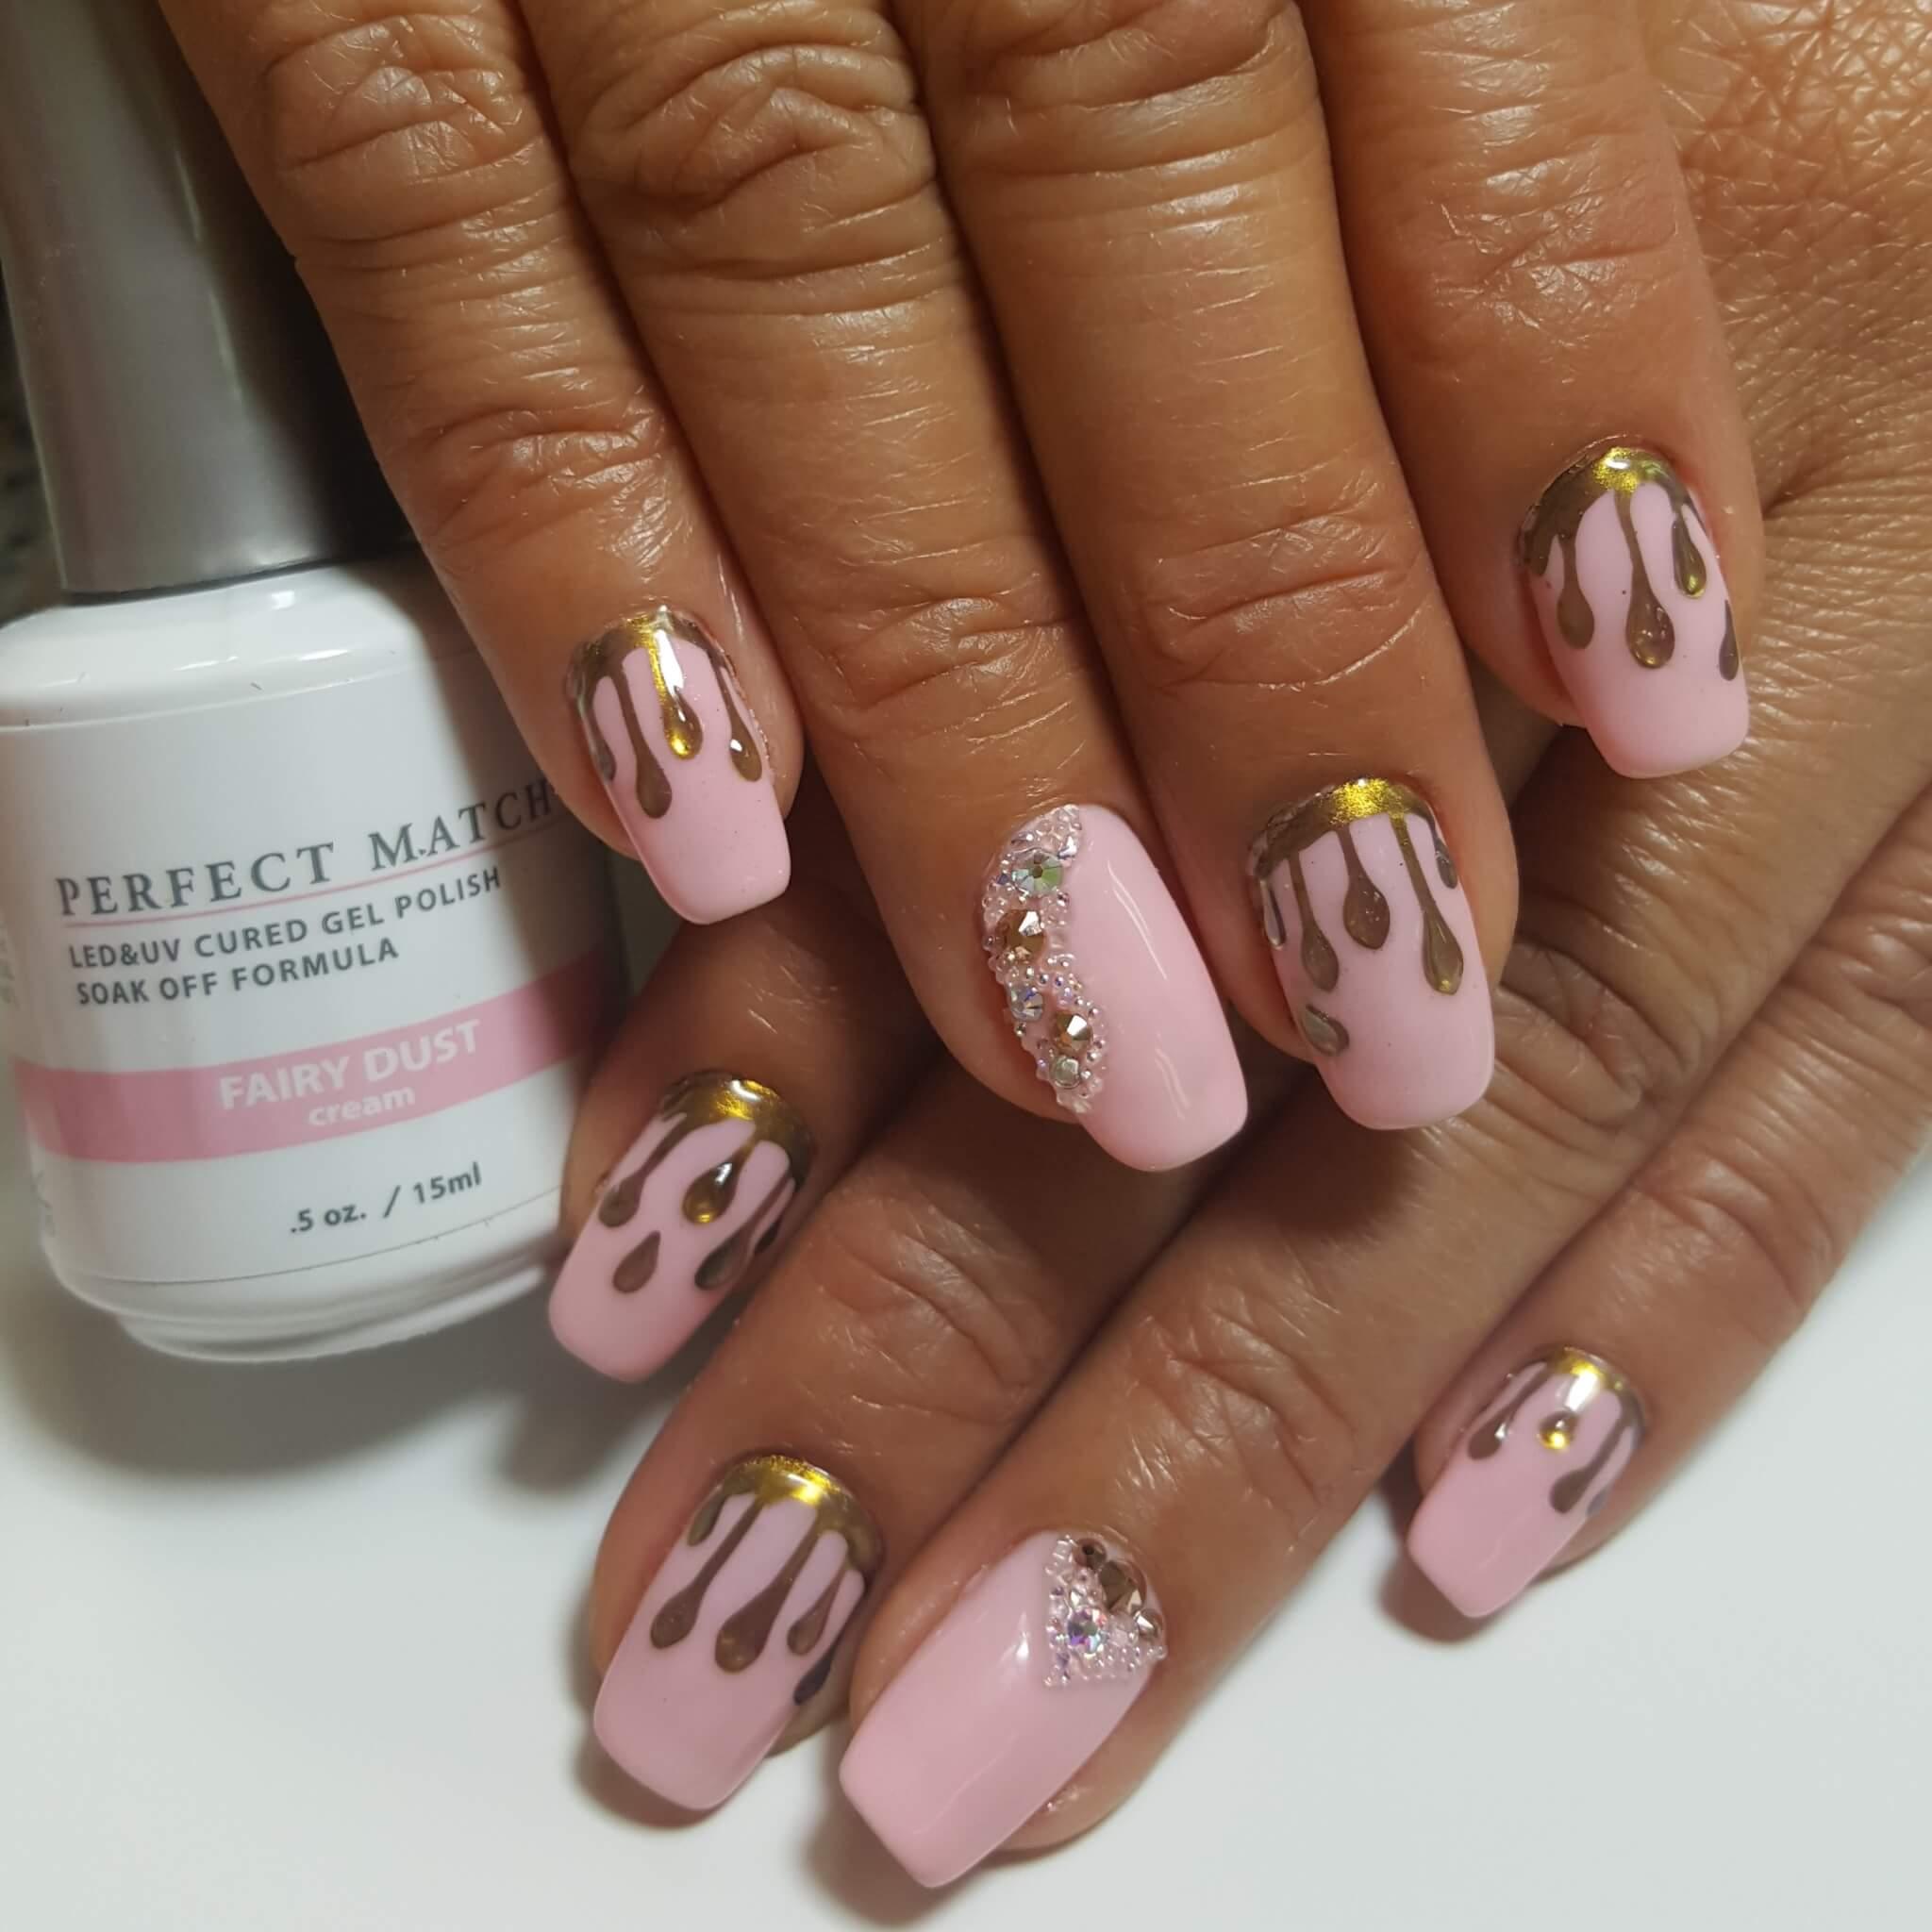 set of pink nails with golden details.